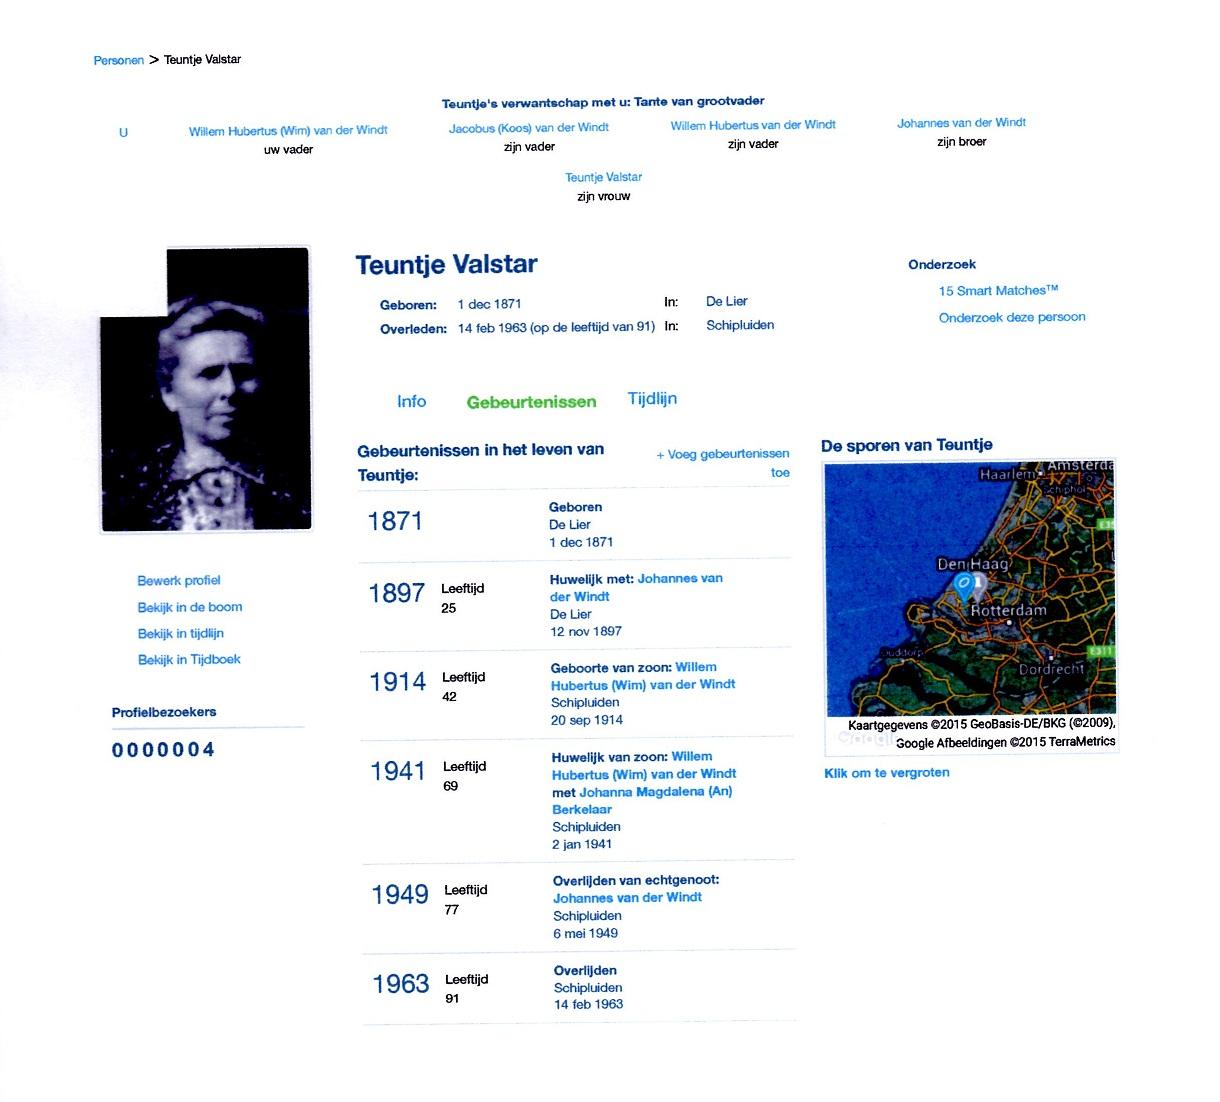 1871-12-01 Geboorte Teuntje Valstar